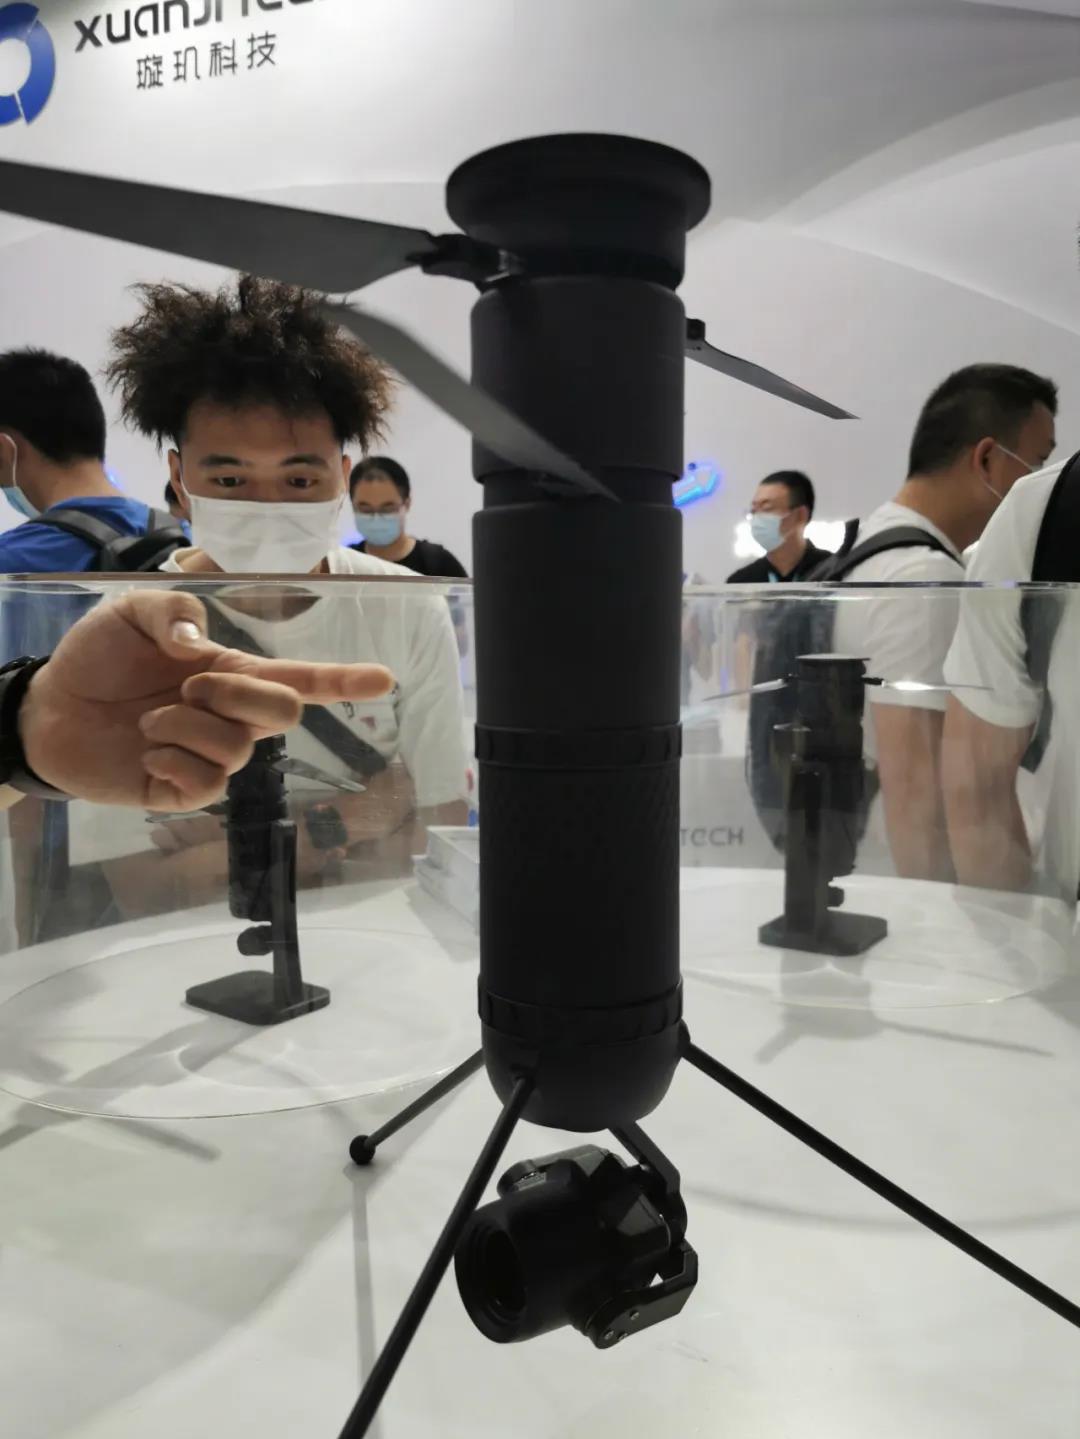 xuanji tech - uav exhibition - grepow share info